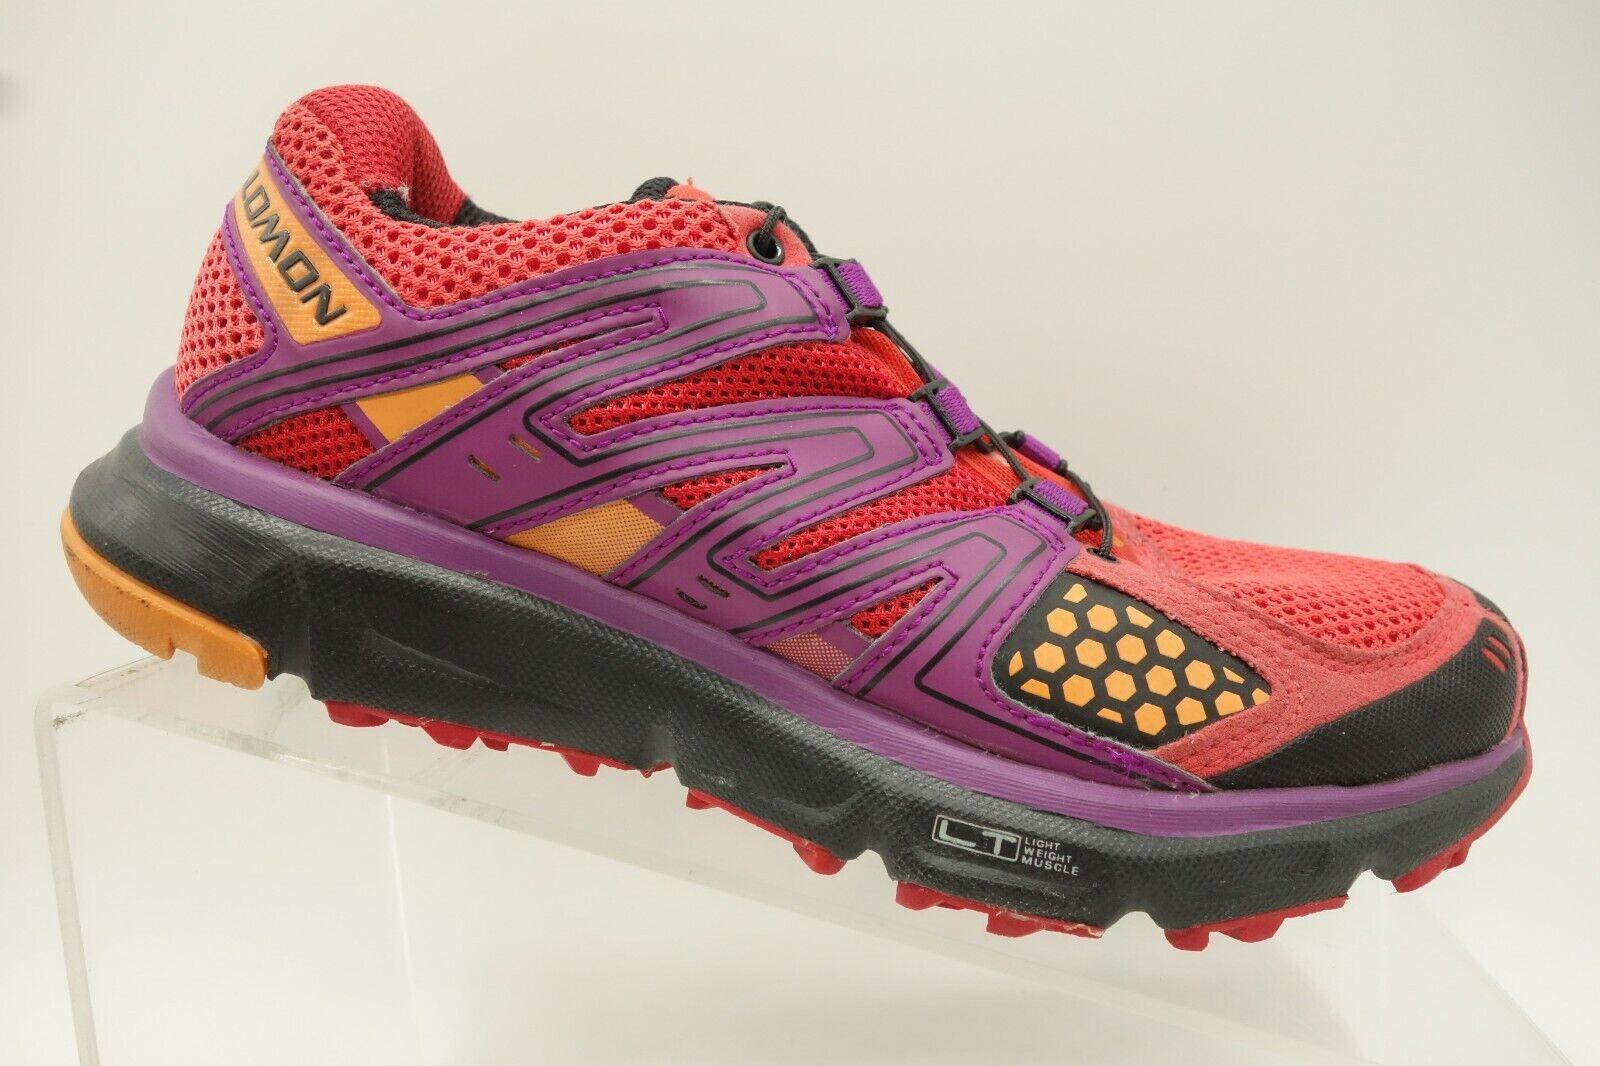 Salomon XR Mission Multi color Mesh Athletic Sneaker shoes Womens 5